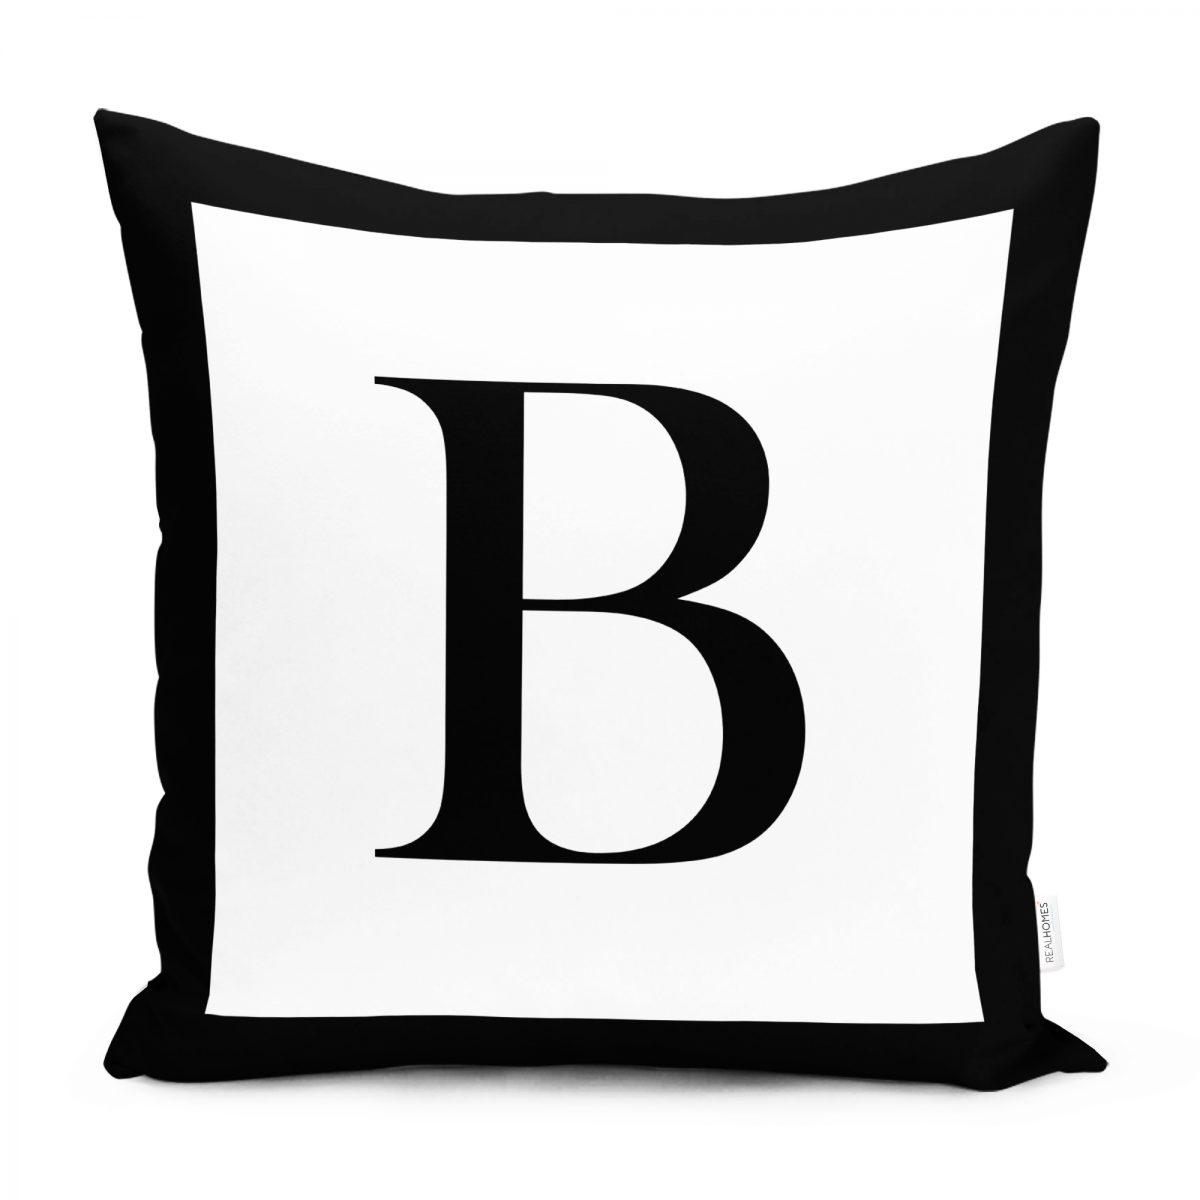 RealHomes Siyah Beyaz B Harfli Yastık Kırlent Kılıfı Realhomes